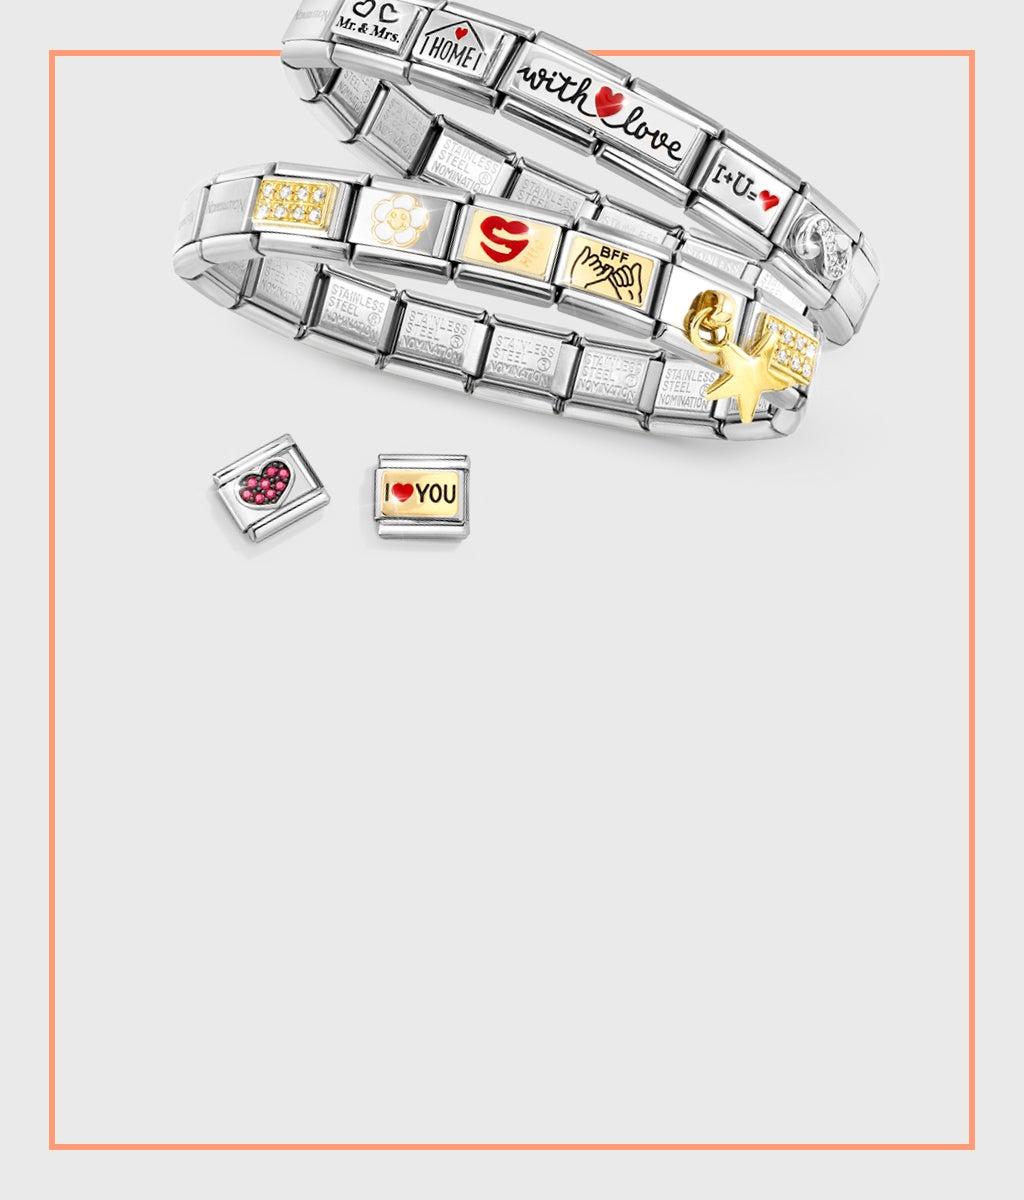 complete your Bracelet FREE!